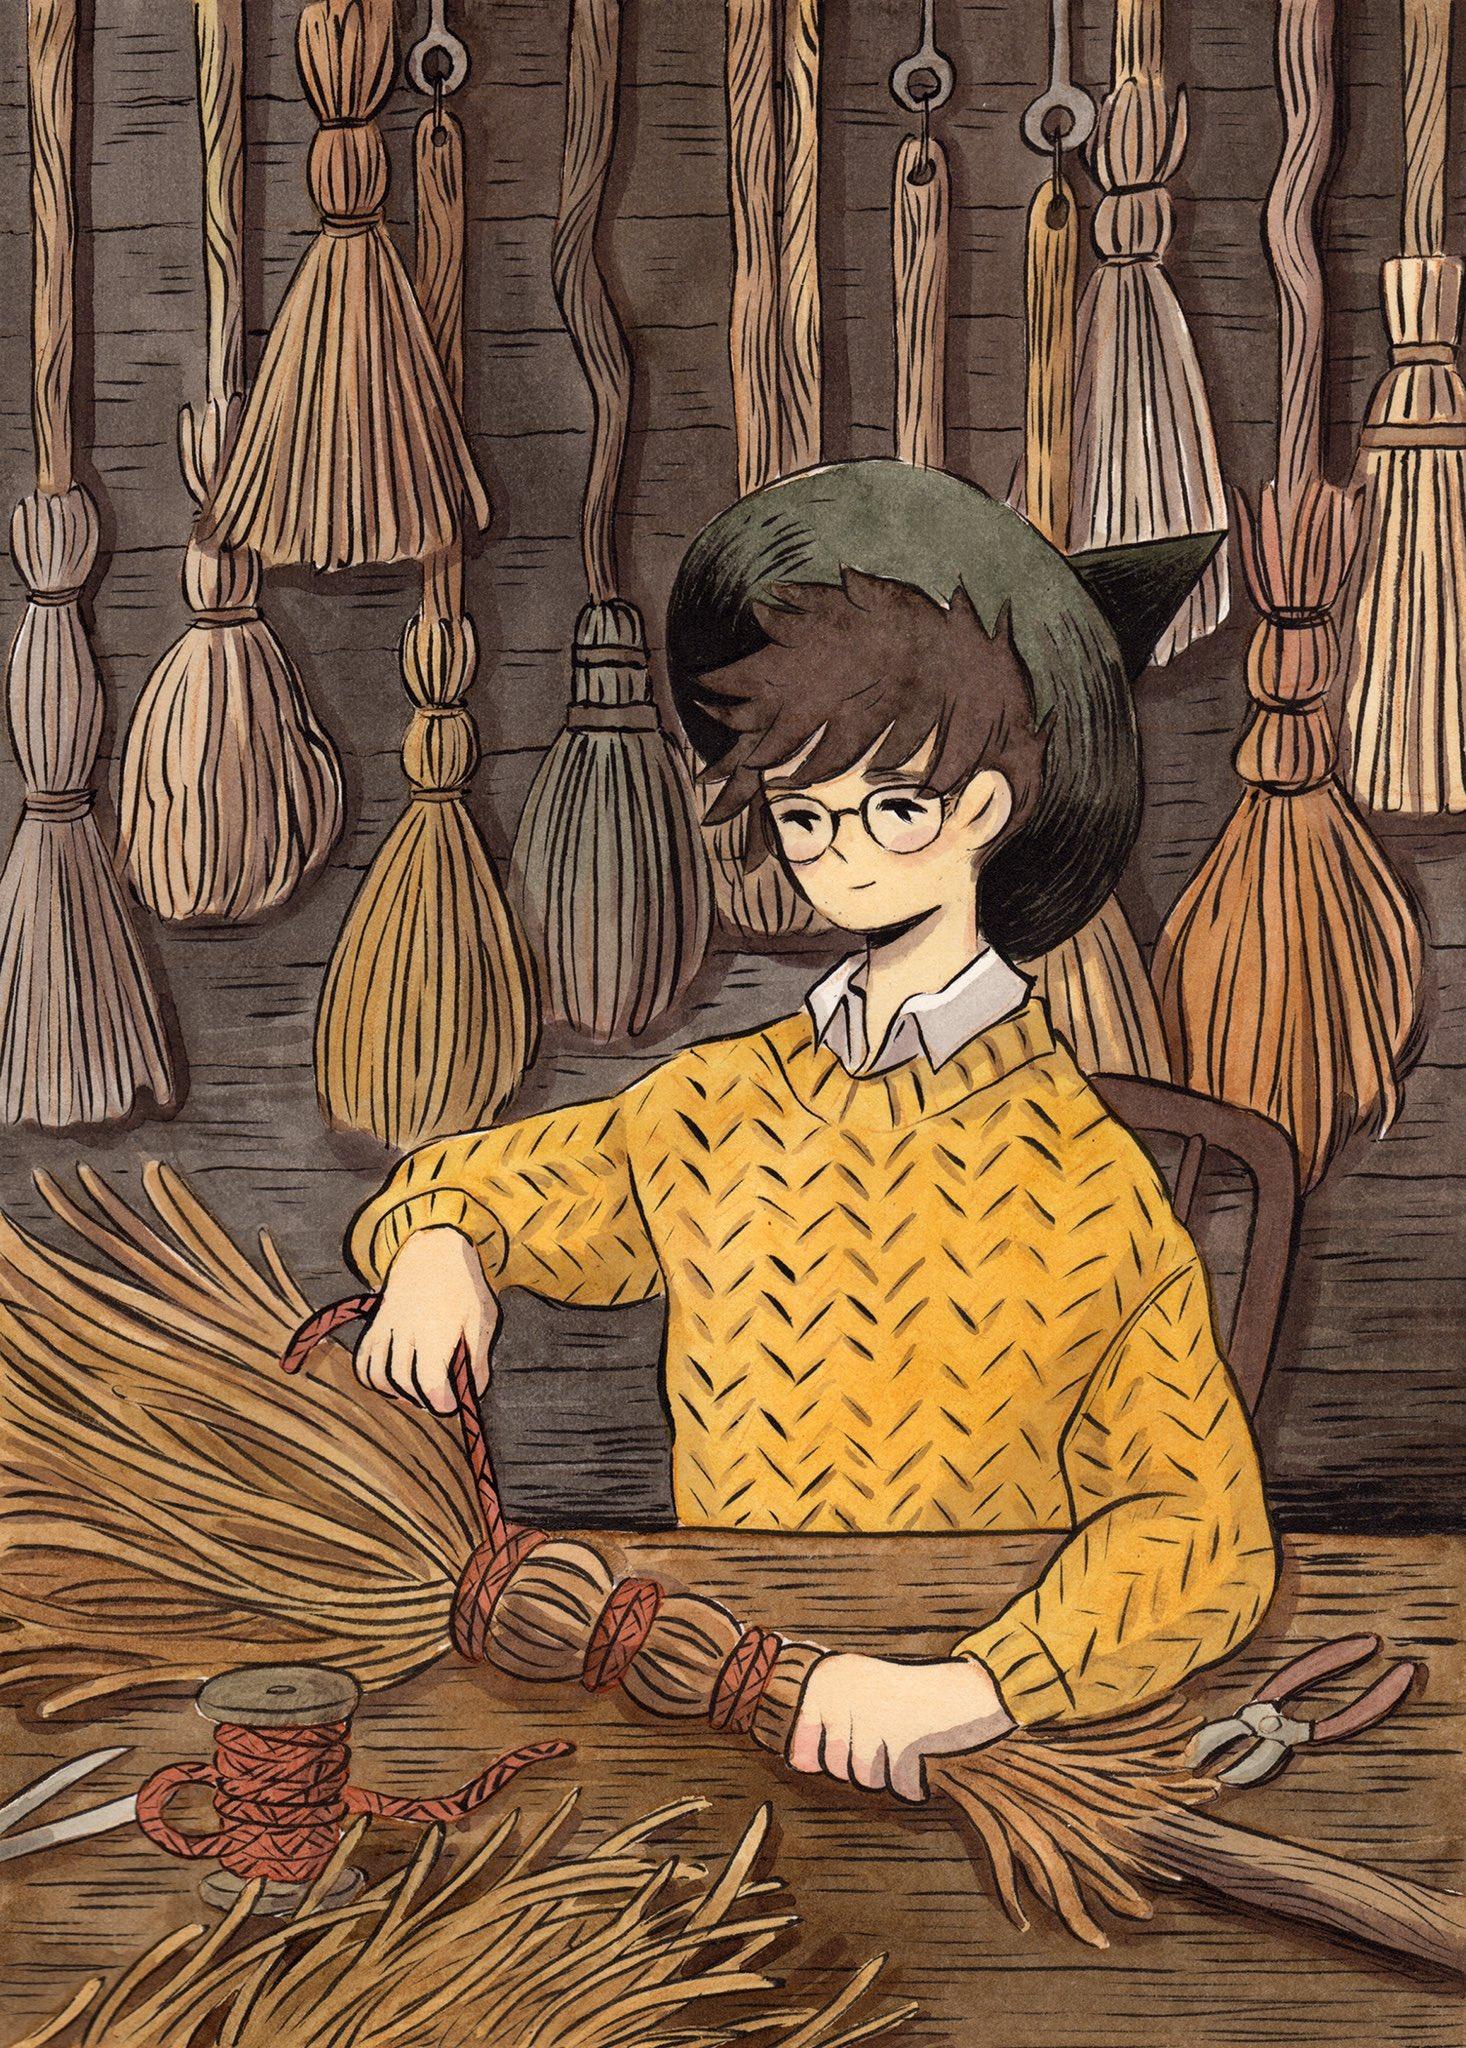 Inktober day 29, Broom Maker https://t.co/2yQgexGuz4